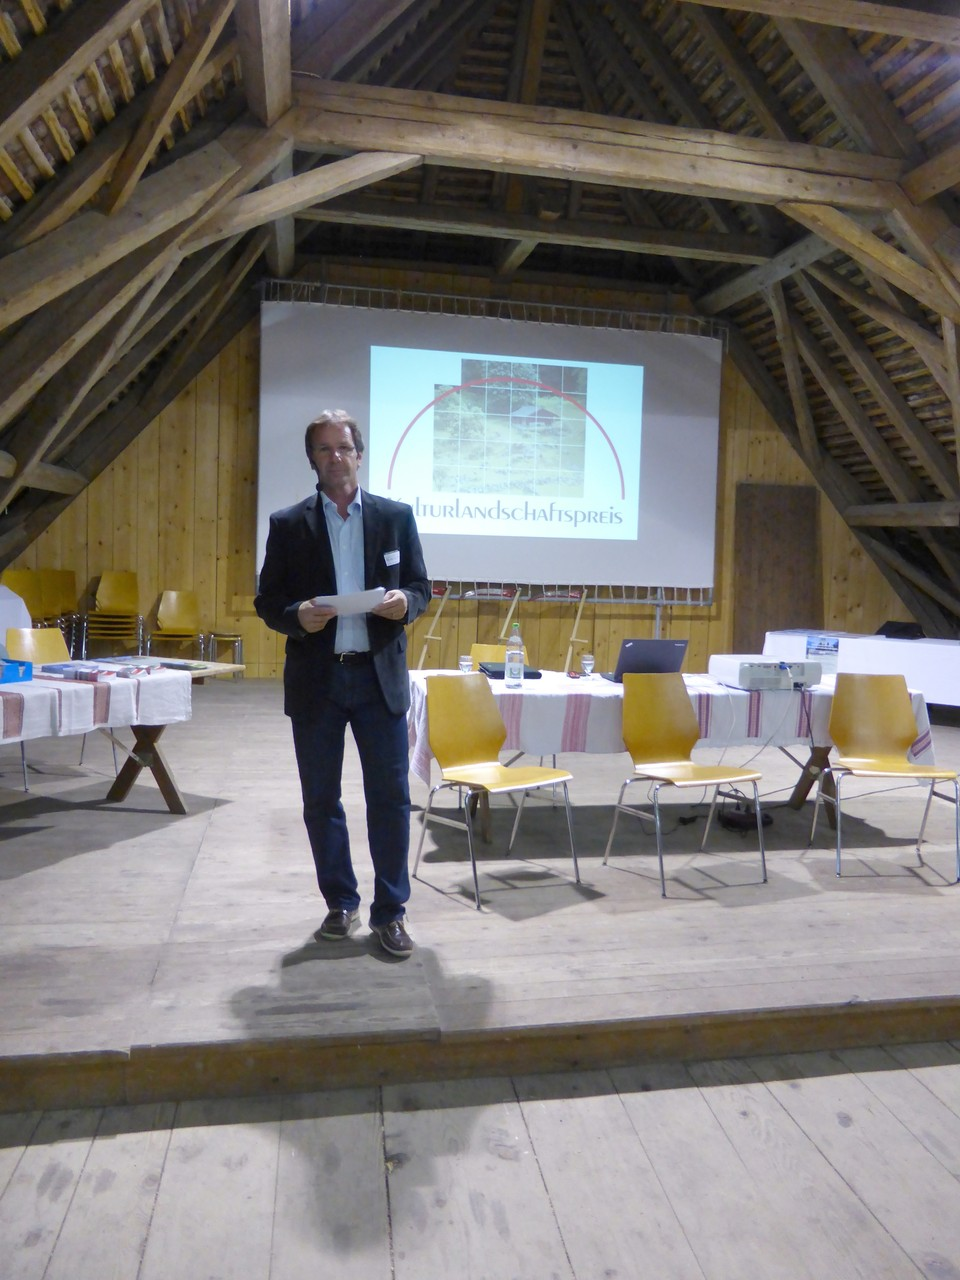 Jubiläumsansprache durch Peter Flück, Präsident der Regionalkonferenz Oberland-Ost